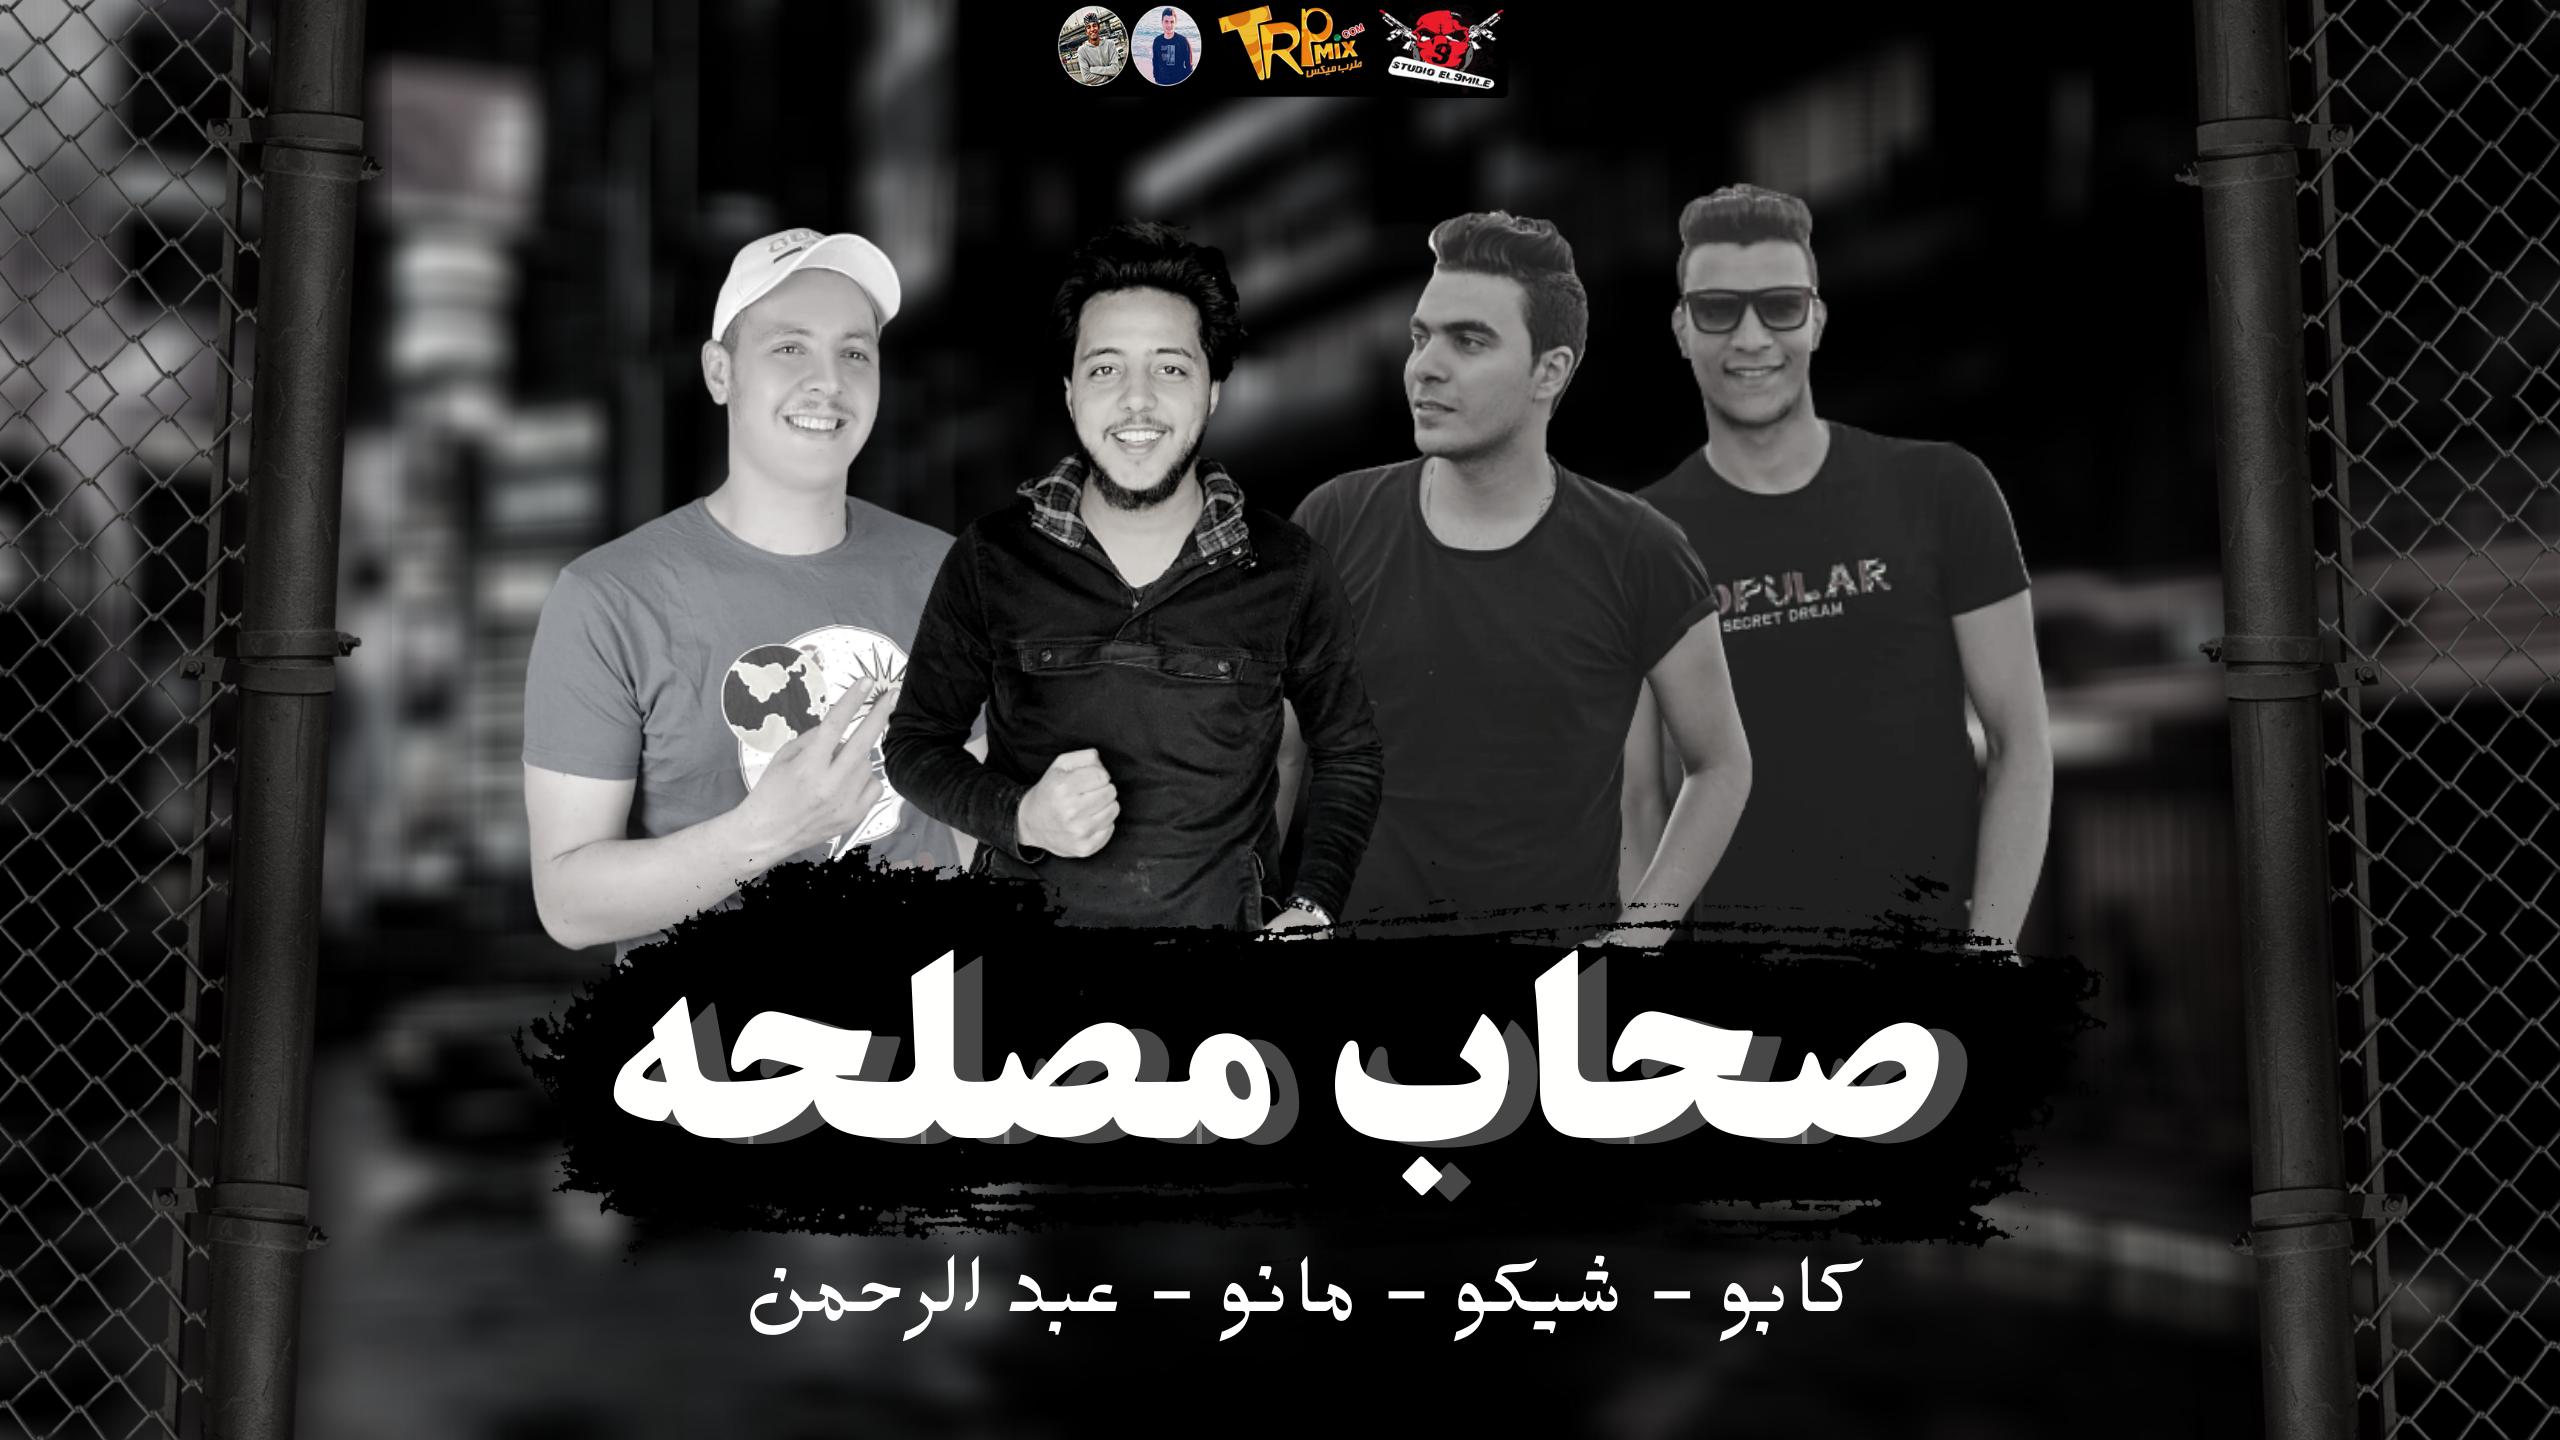 مهرجان صحاب مصلحه كابو - شيكو - مانو - عبد الرحمن 2020